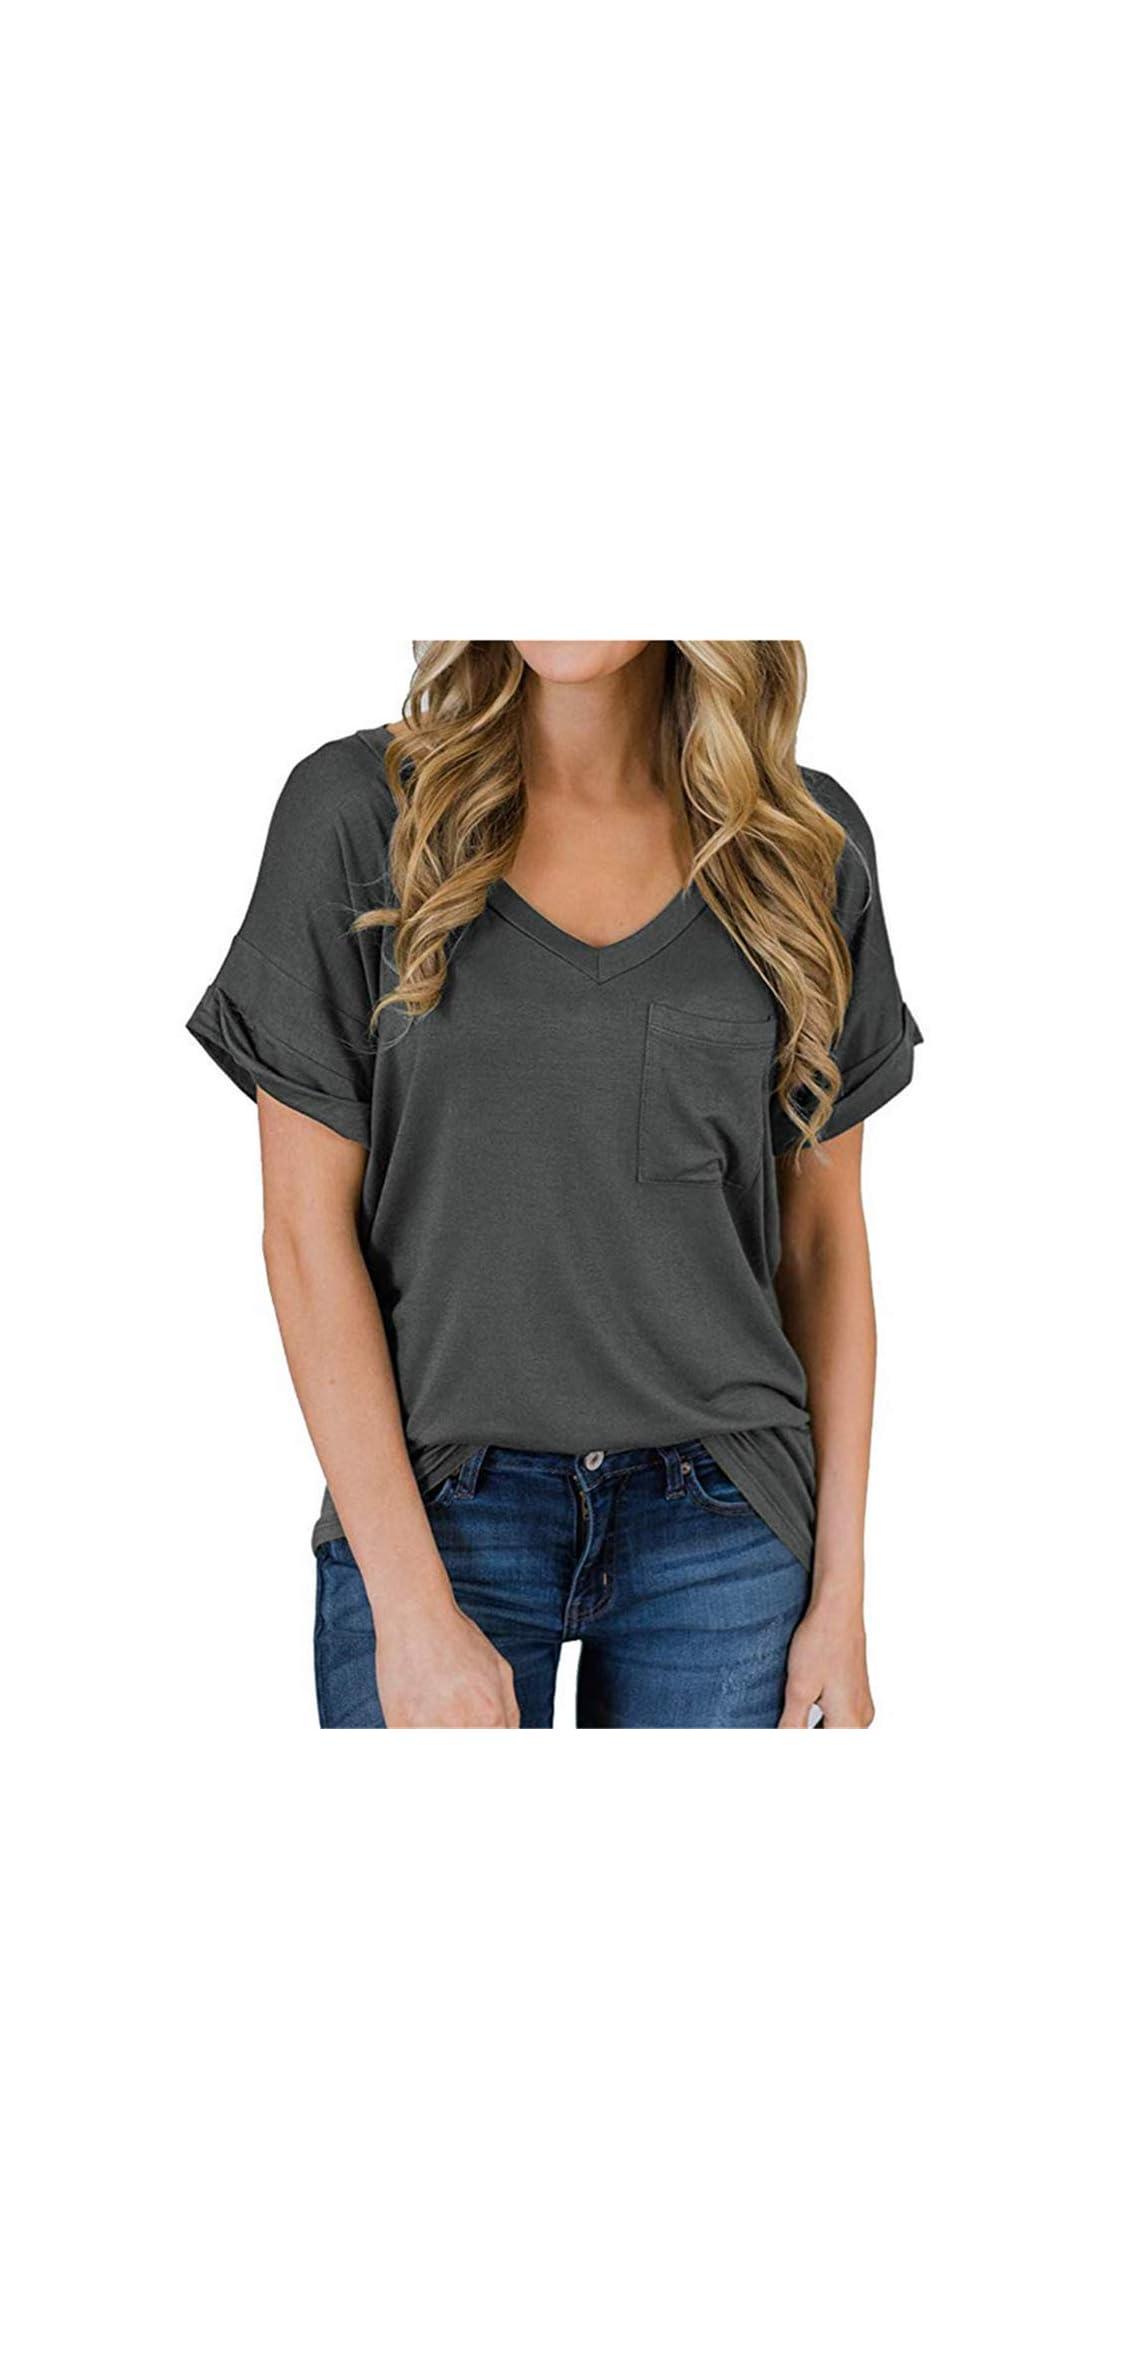 Women's Short Sleeve V-neck Shirts Loose Casual Tee